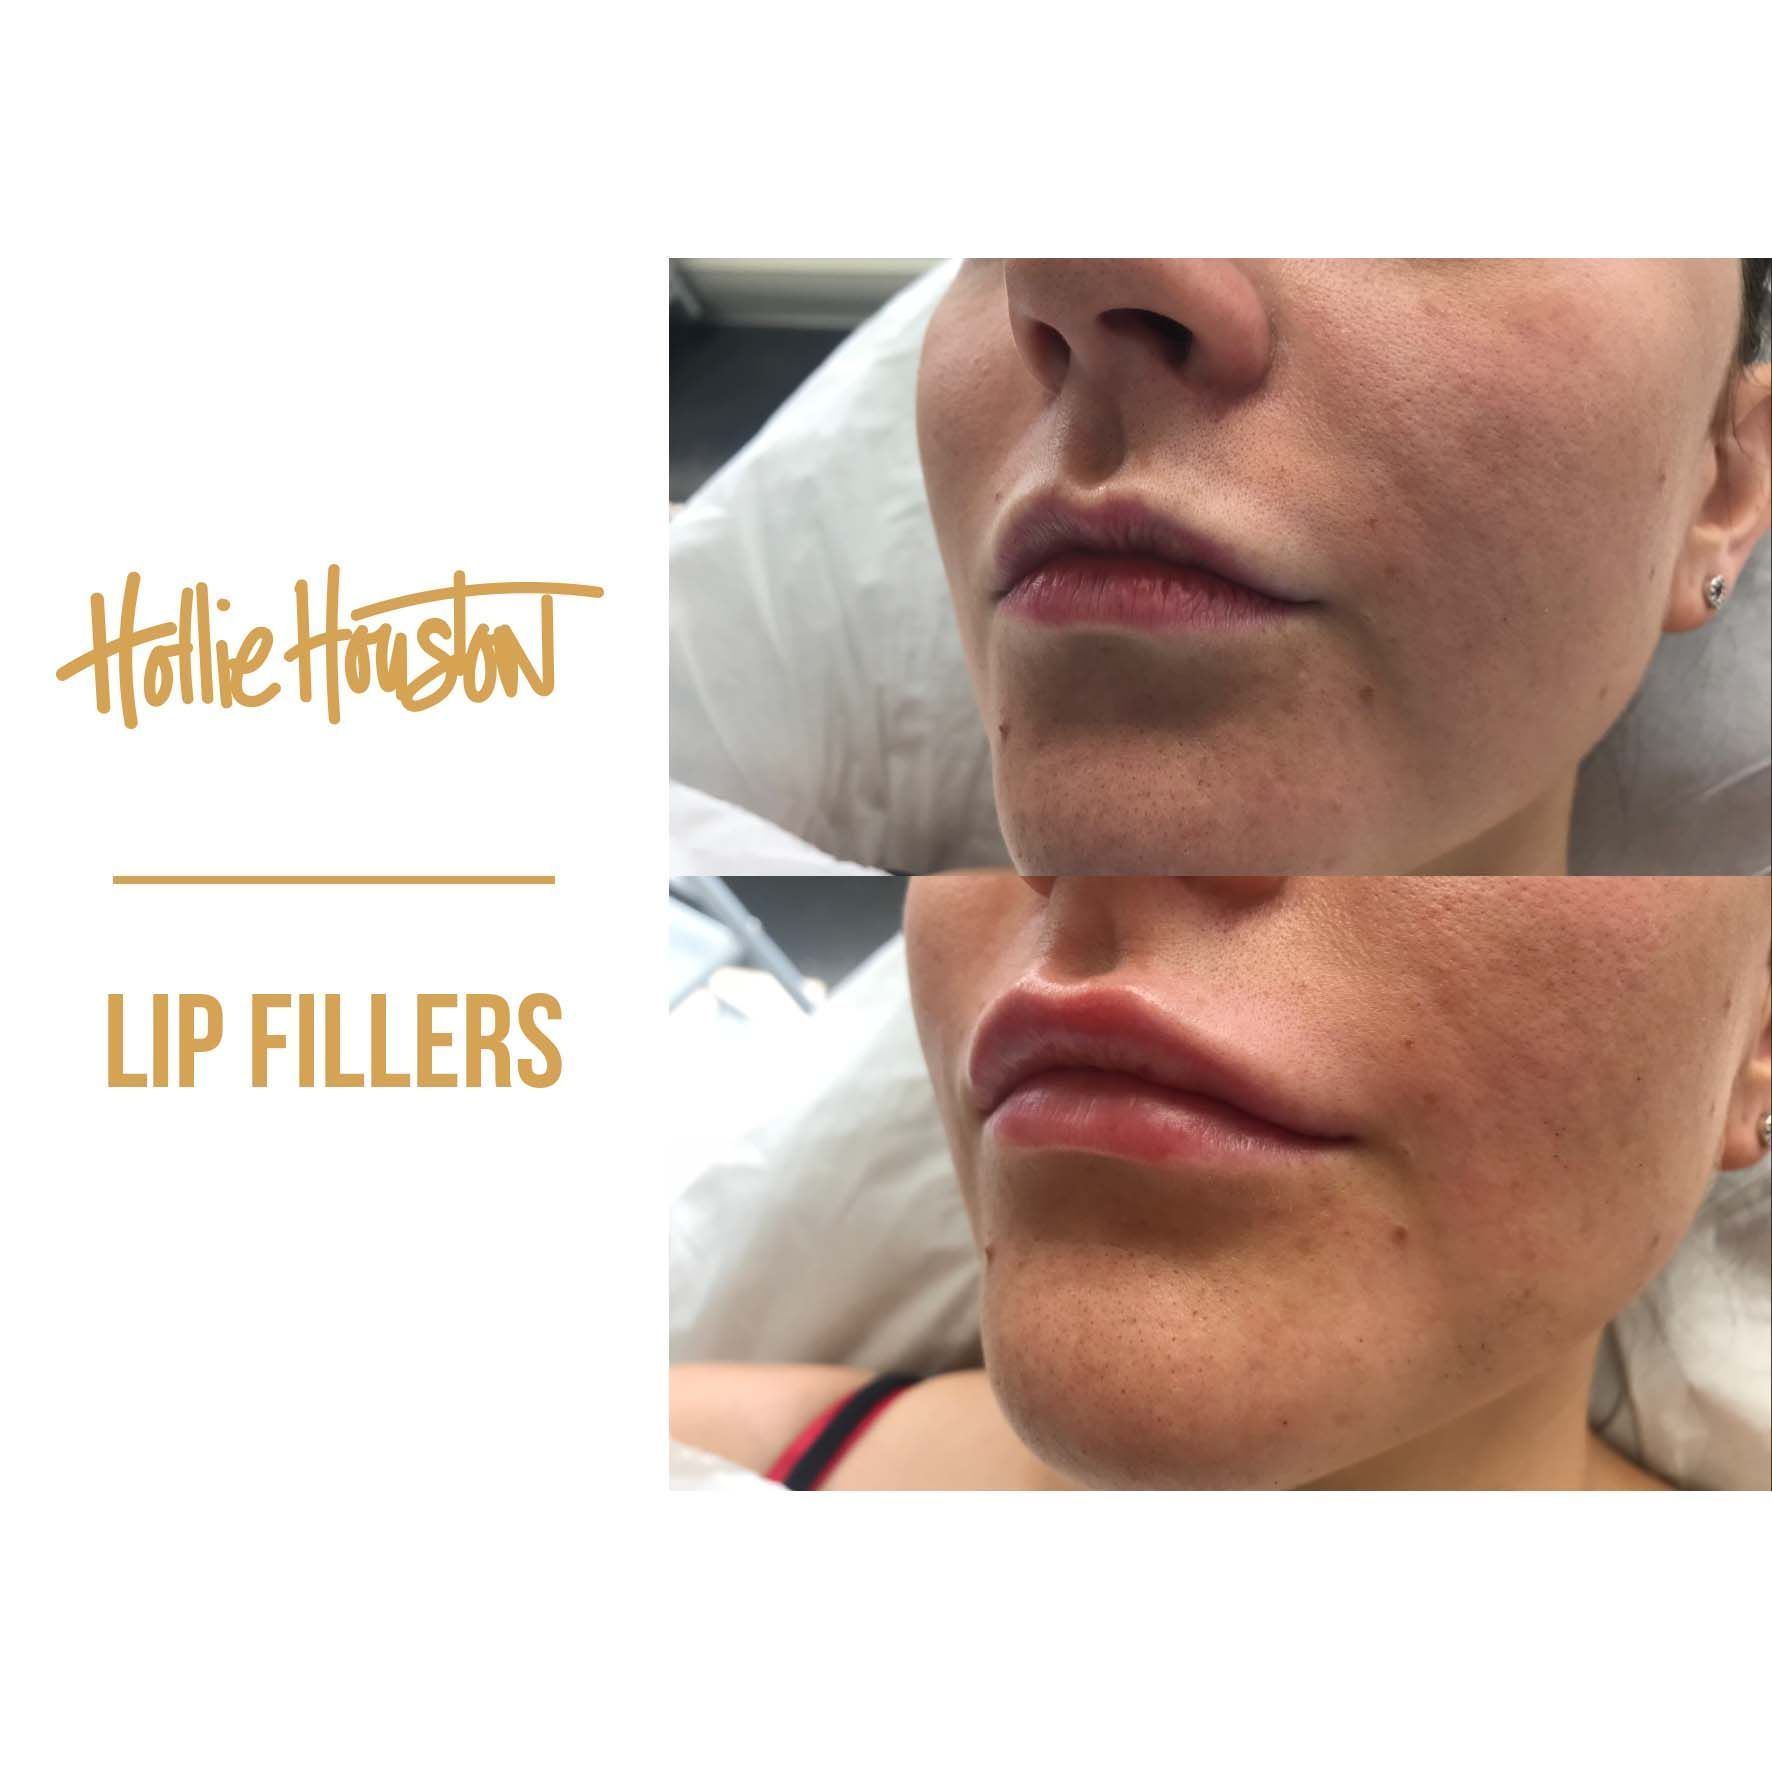 8e0c21d1fb6746c4207bacdf899de662 - How To Get Swelling To Go Down On Lip